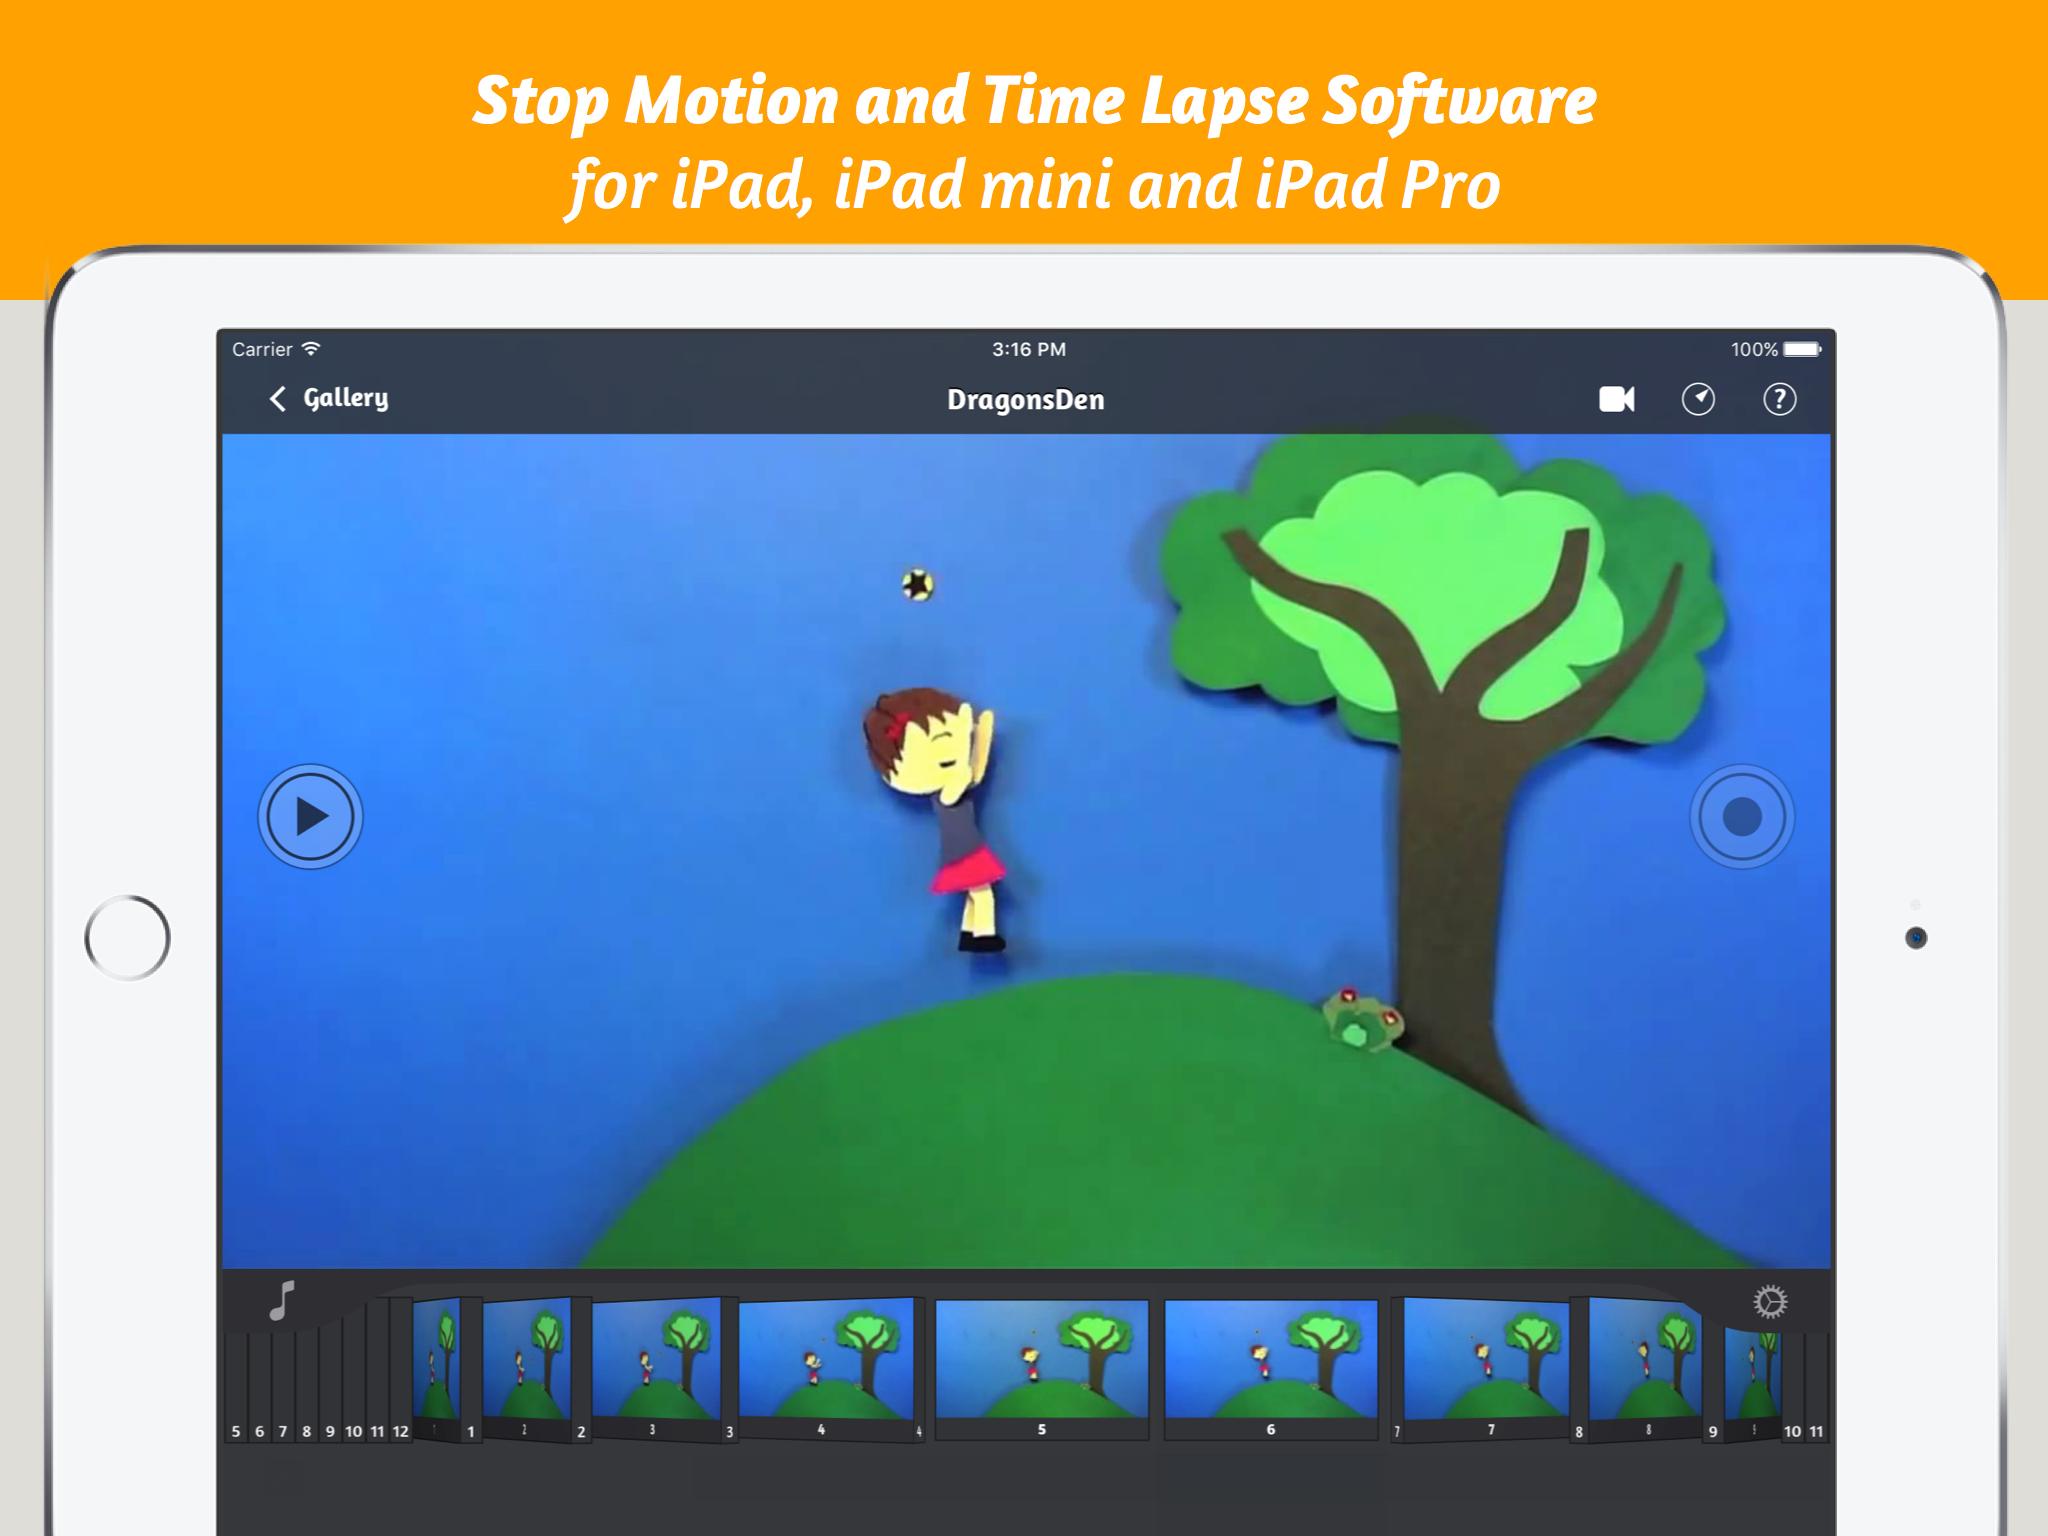 iStopMotioniPad Clip